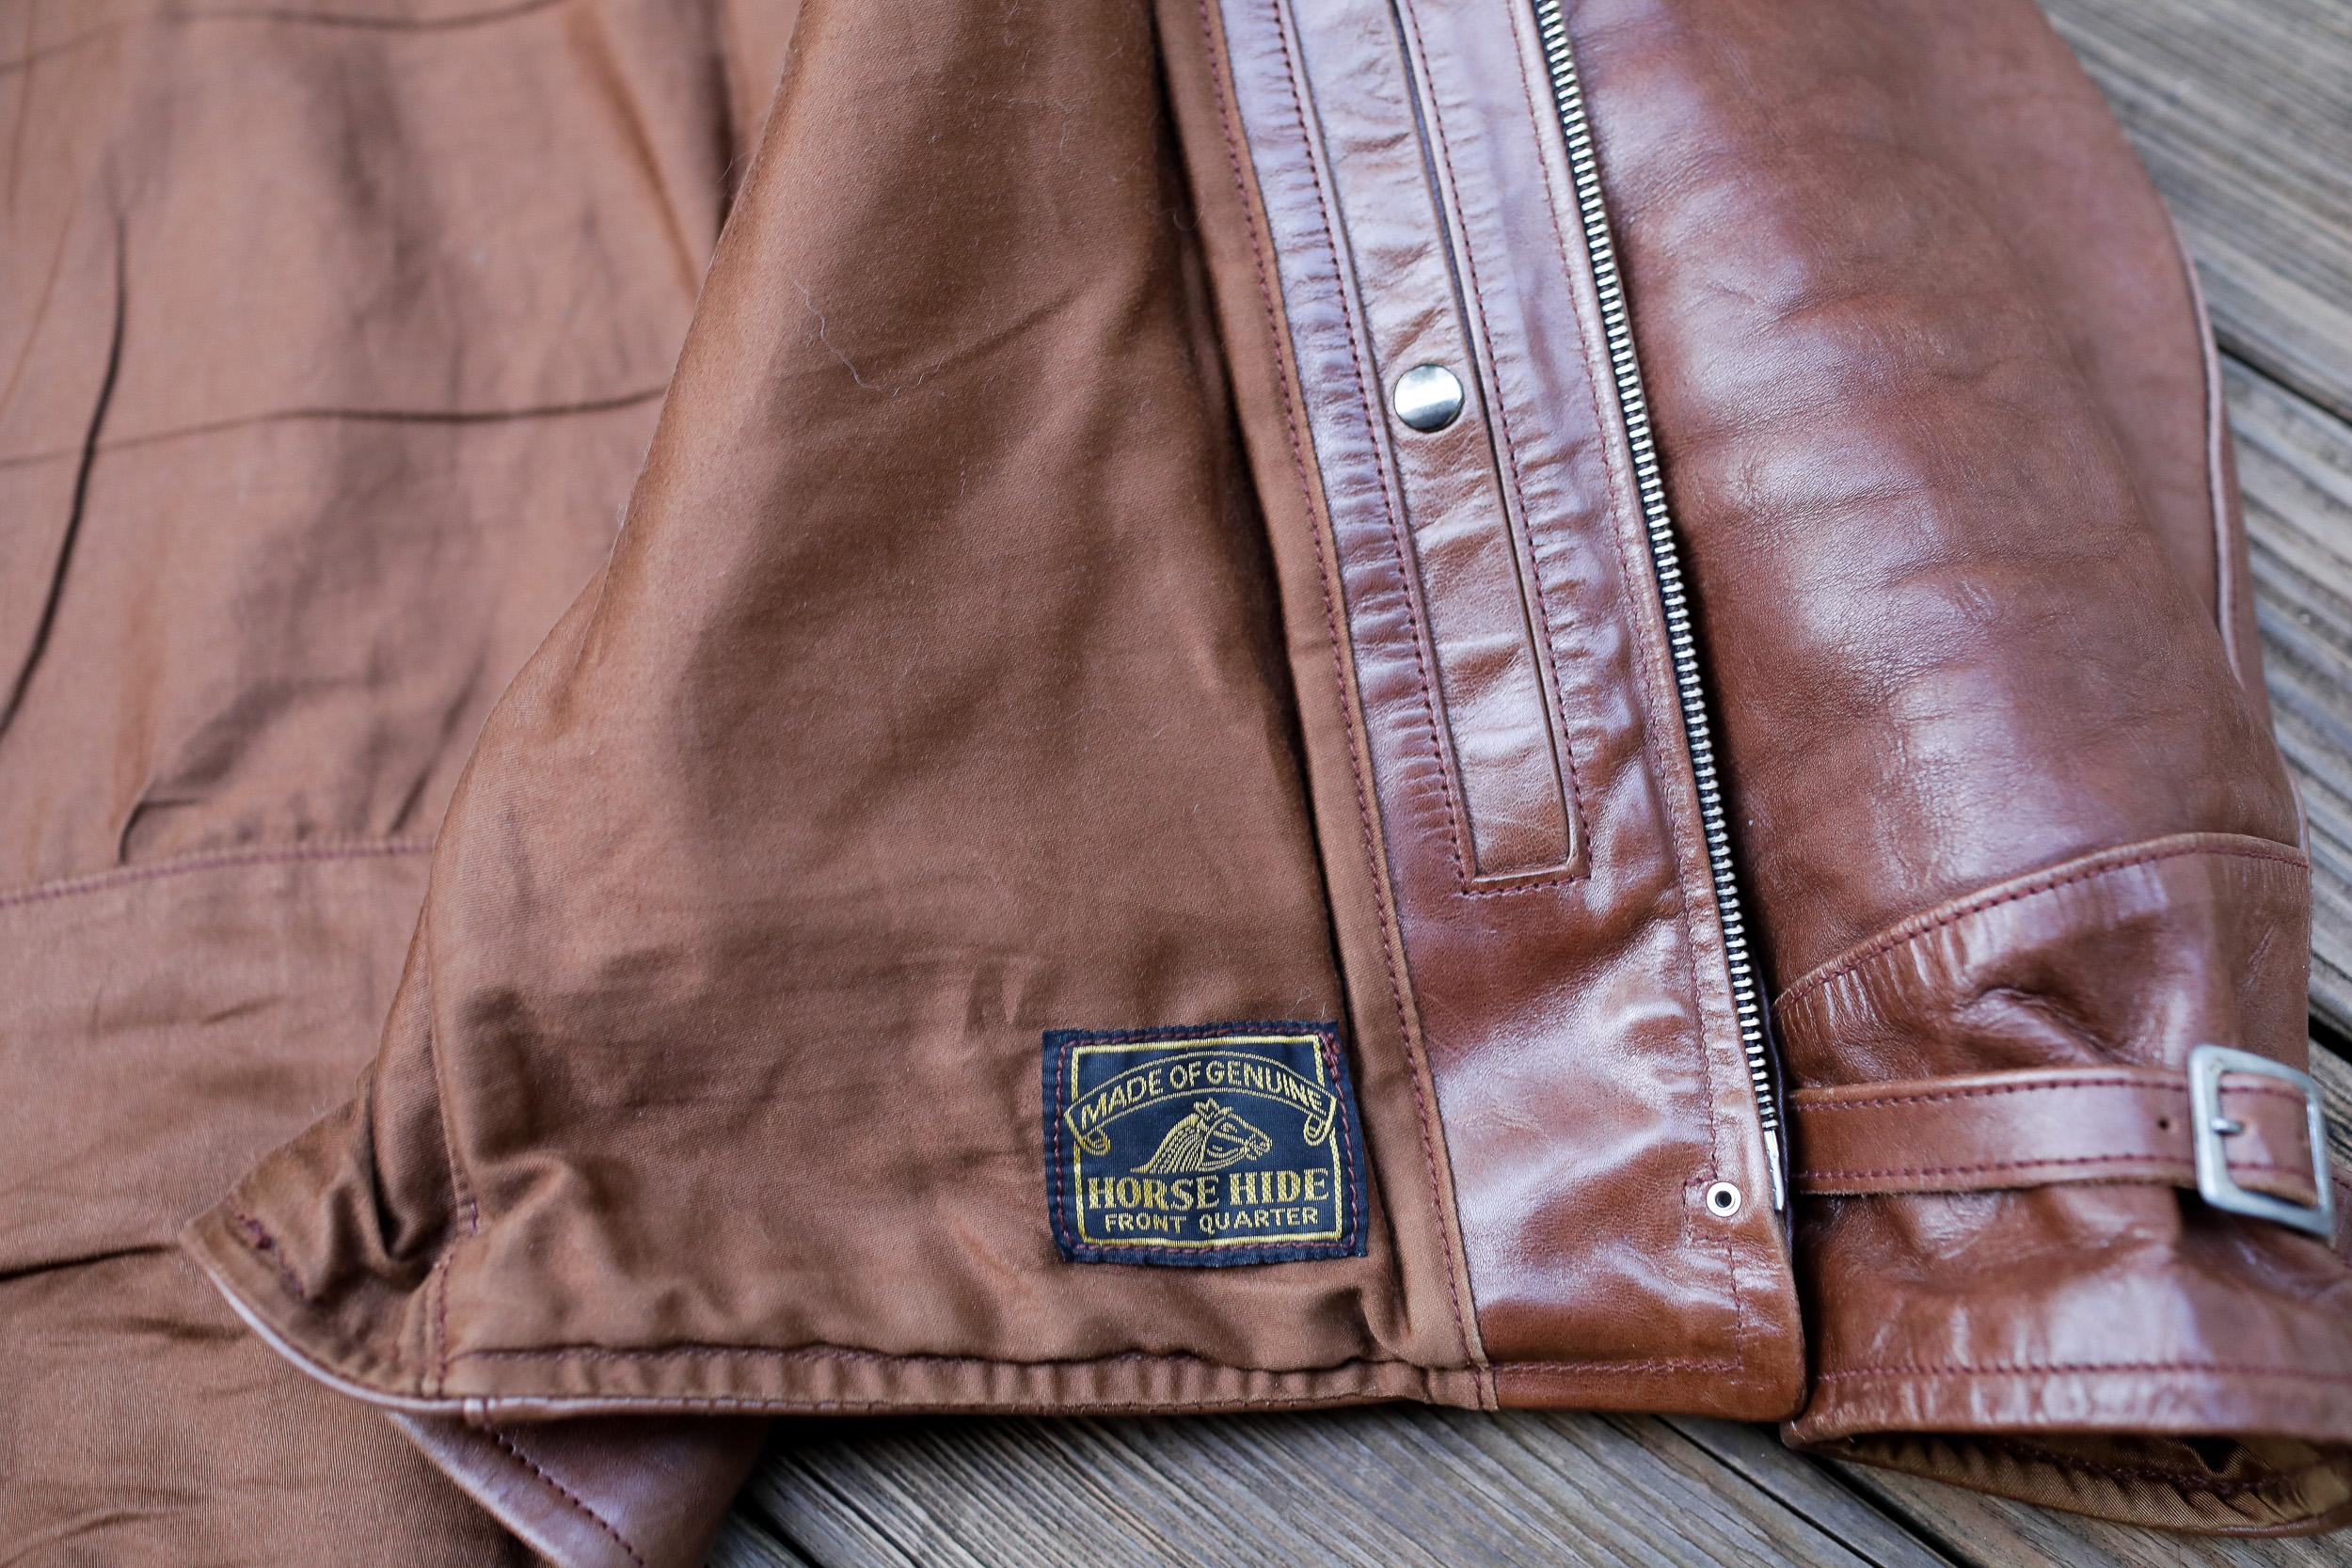 goodwear-calironian-sale-pics-10.jpg